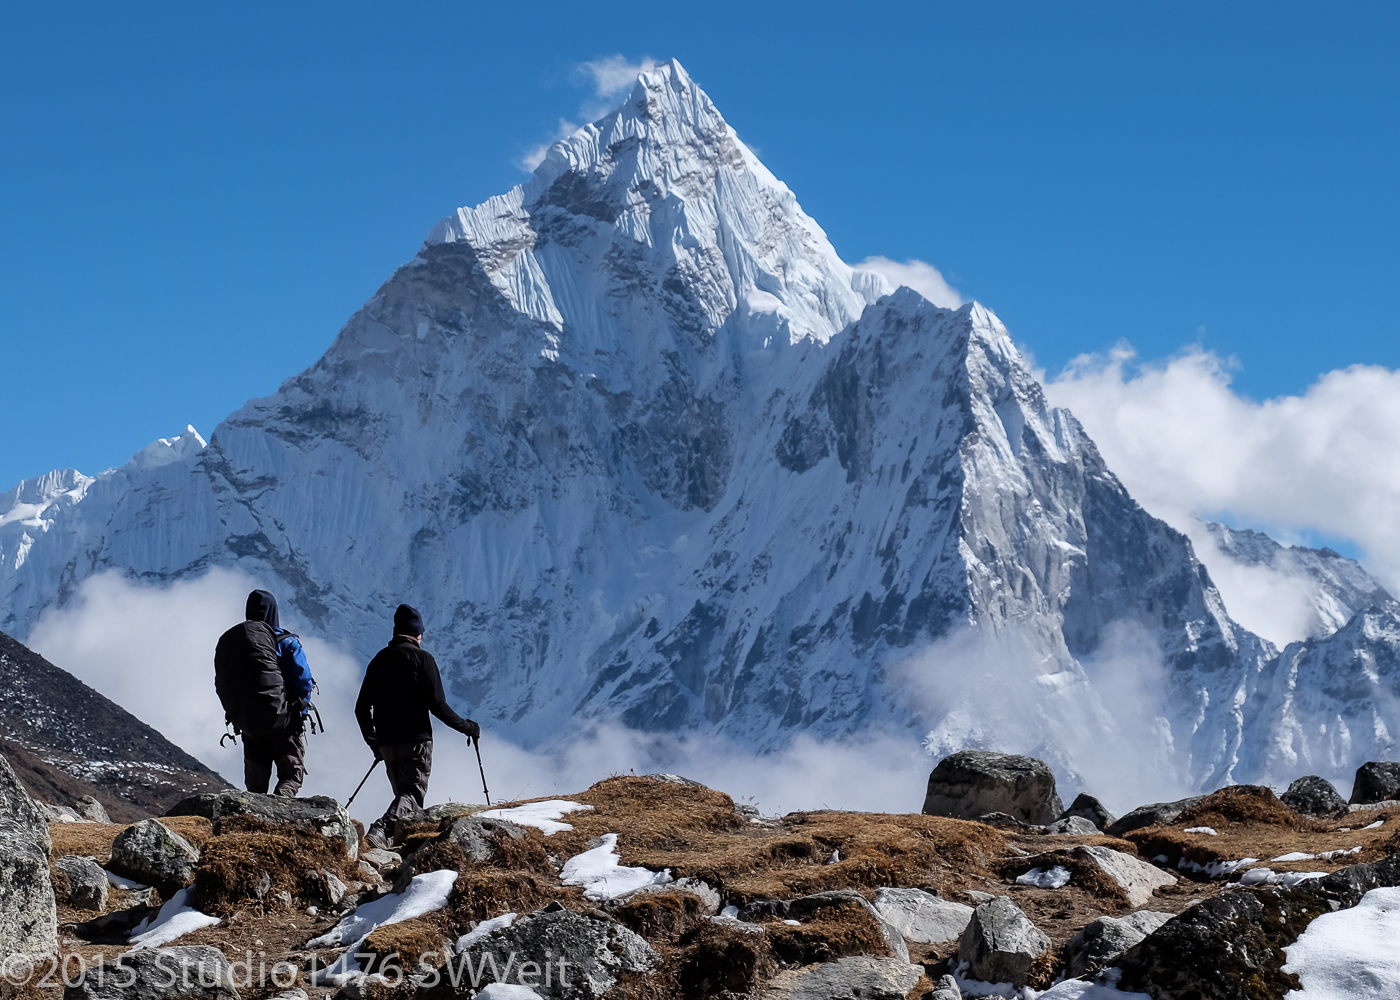 Mt. Everest Lodge Trek, Nepal: Khumbu Valley Trail – Sierra Club